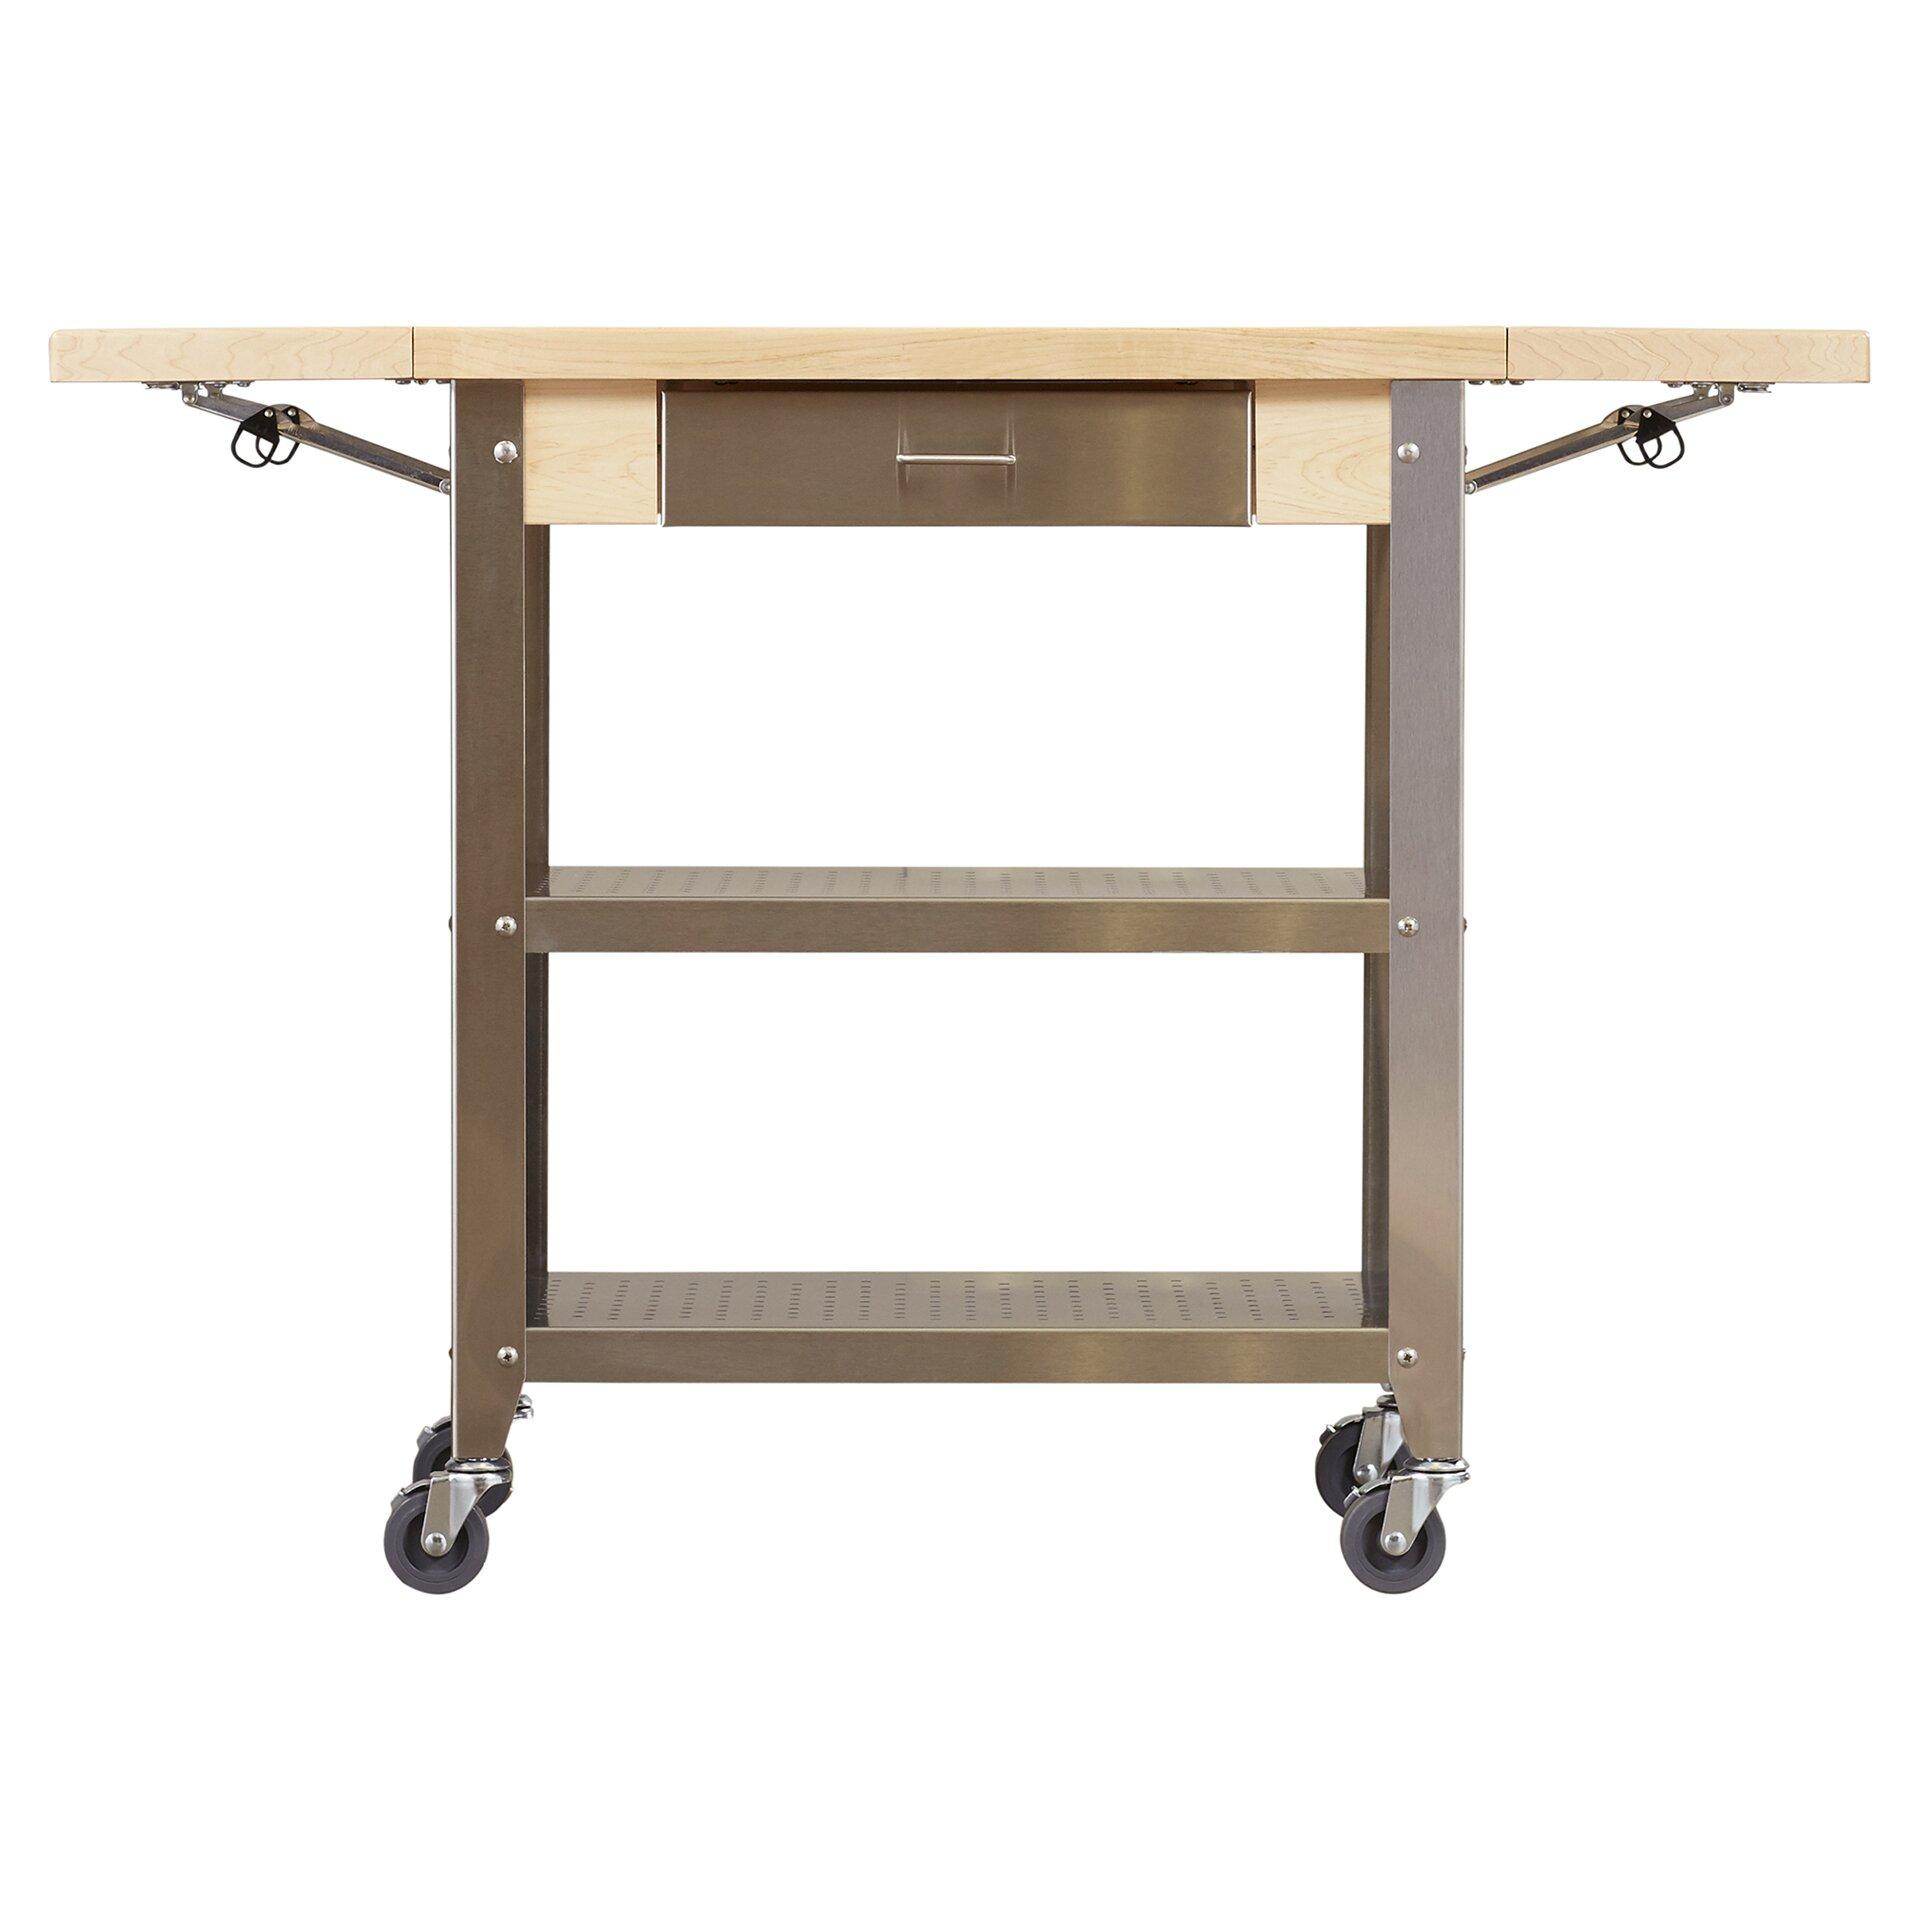 Boos Kitchen Islands Sale John Boos Cucina Americana Kitchen Cart With Wood Top